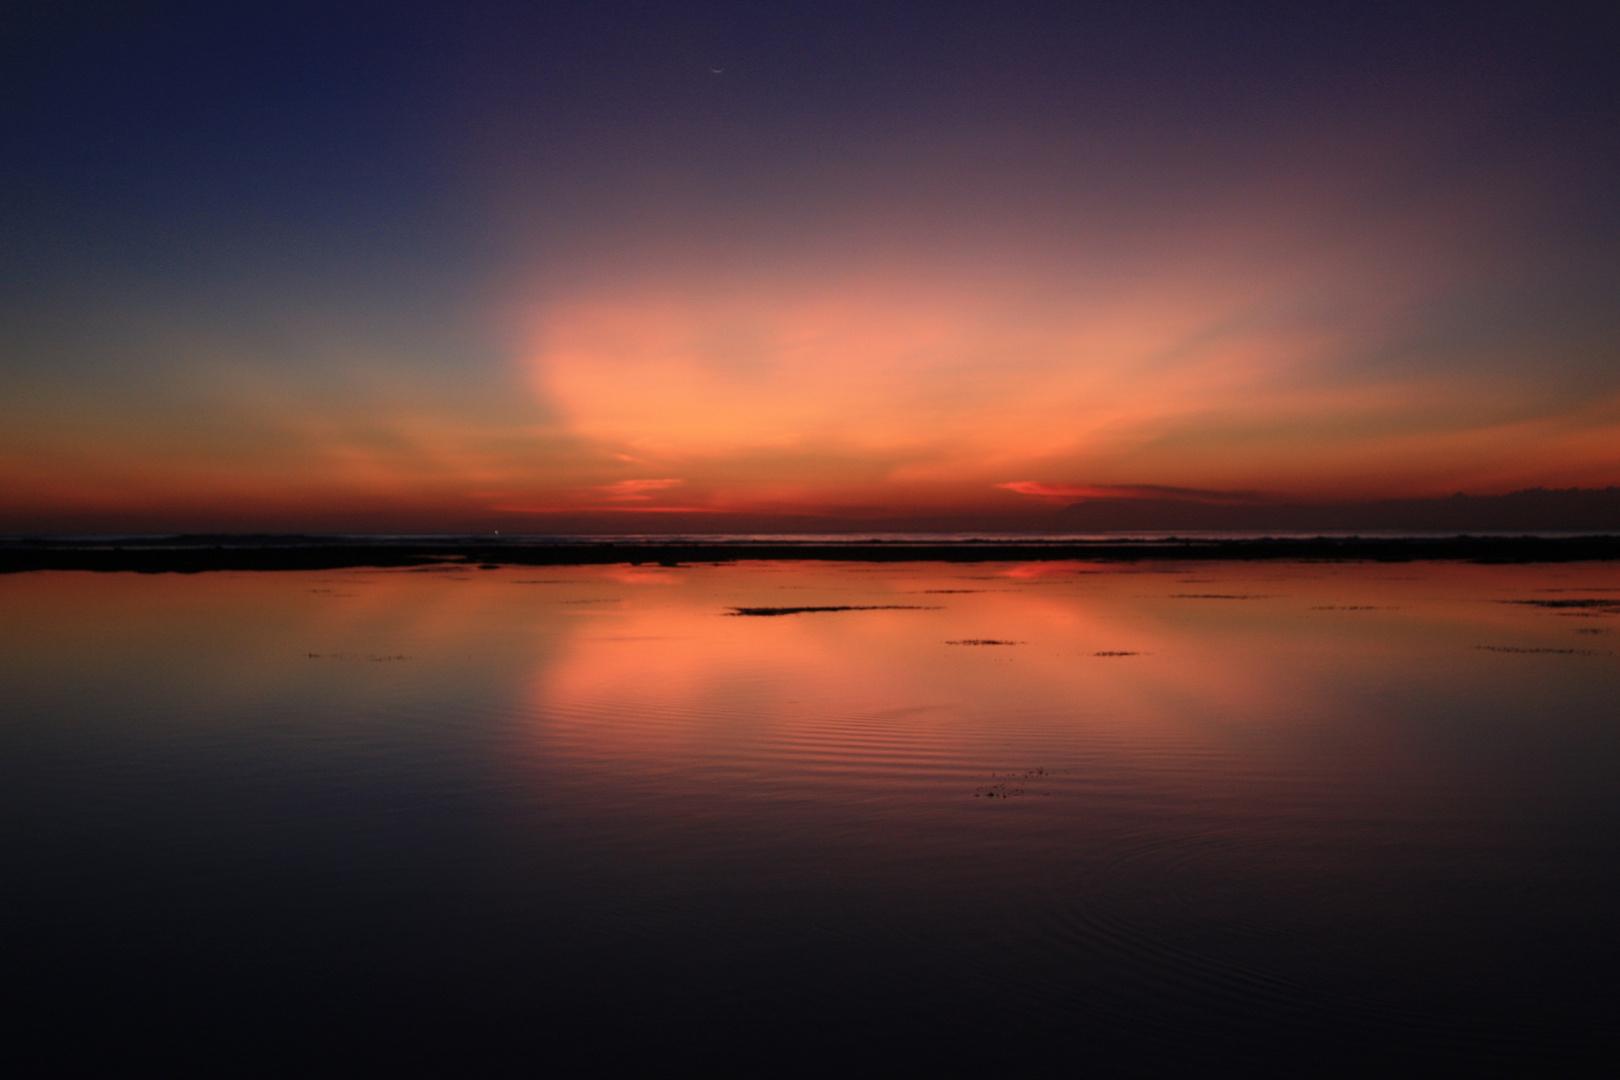 Sunset at Padang Padang Beach (2)